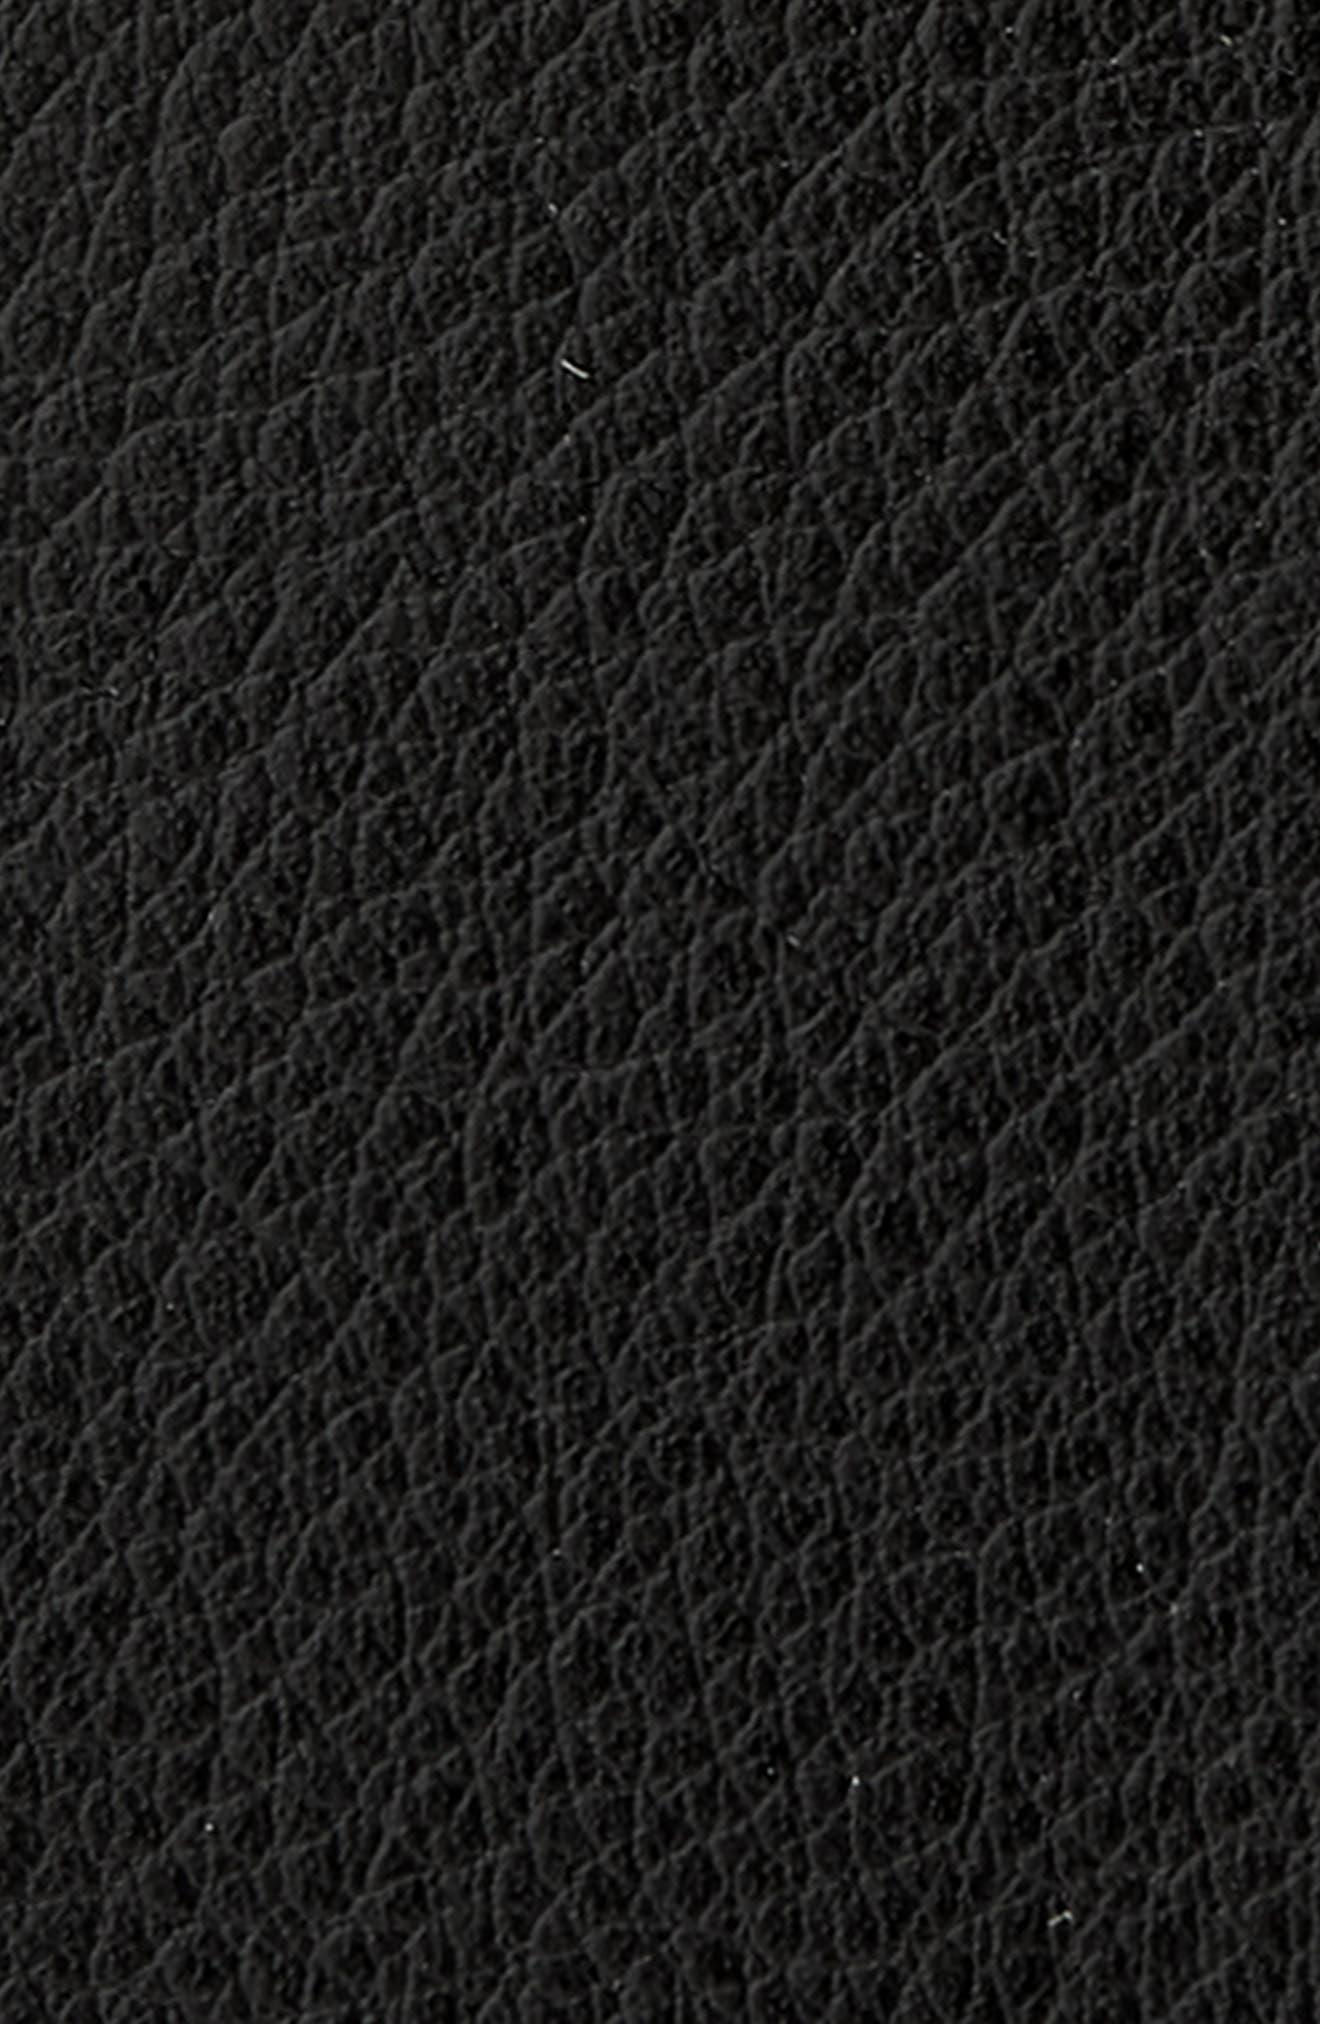 Reming Reversible Leather Belt,                             Alternate thumbnail 3, color,                             BLACK/ BROWN